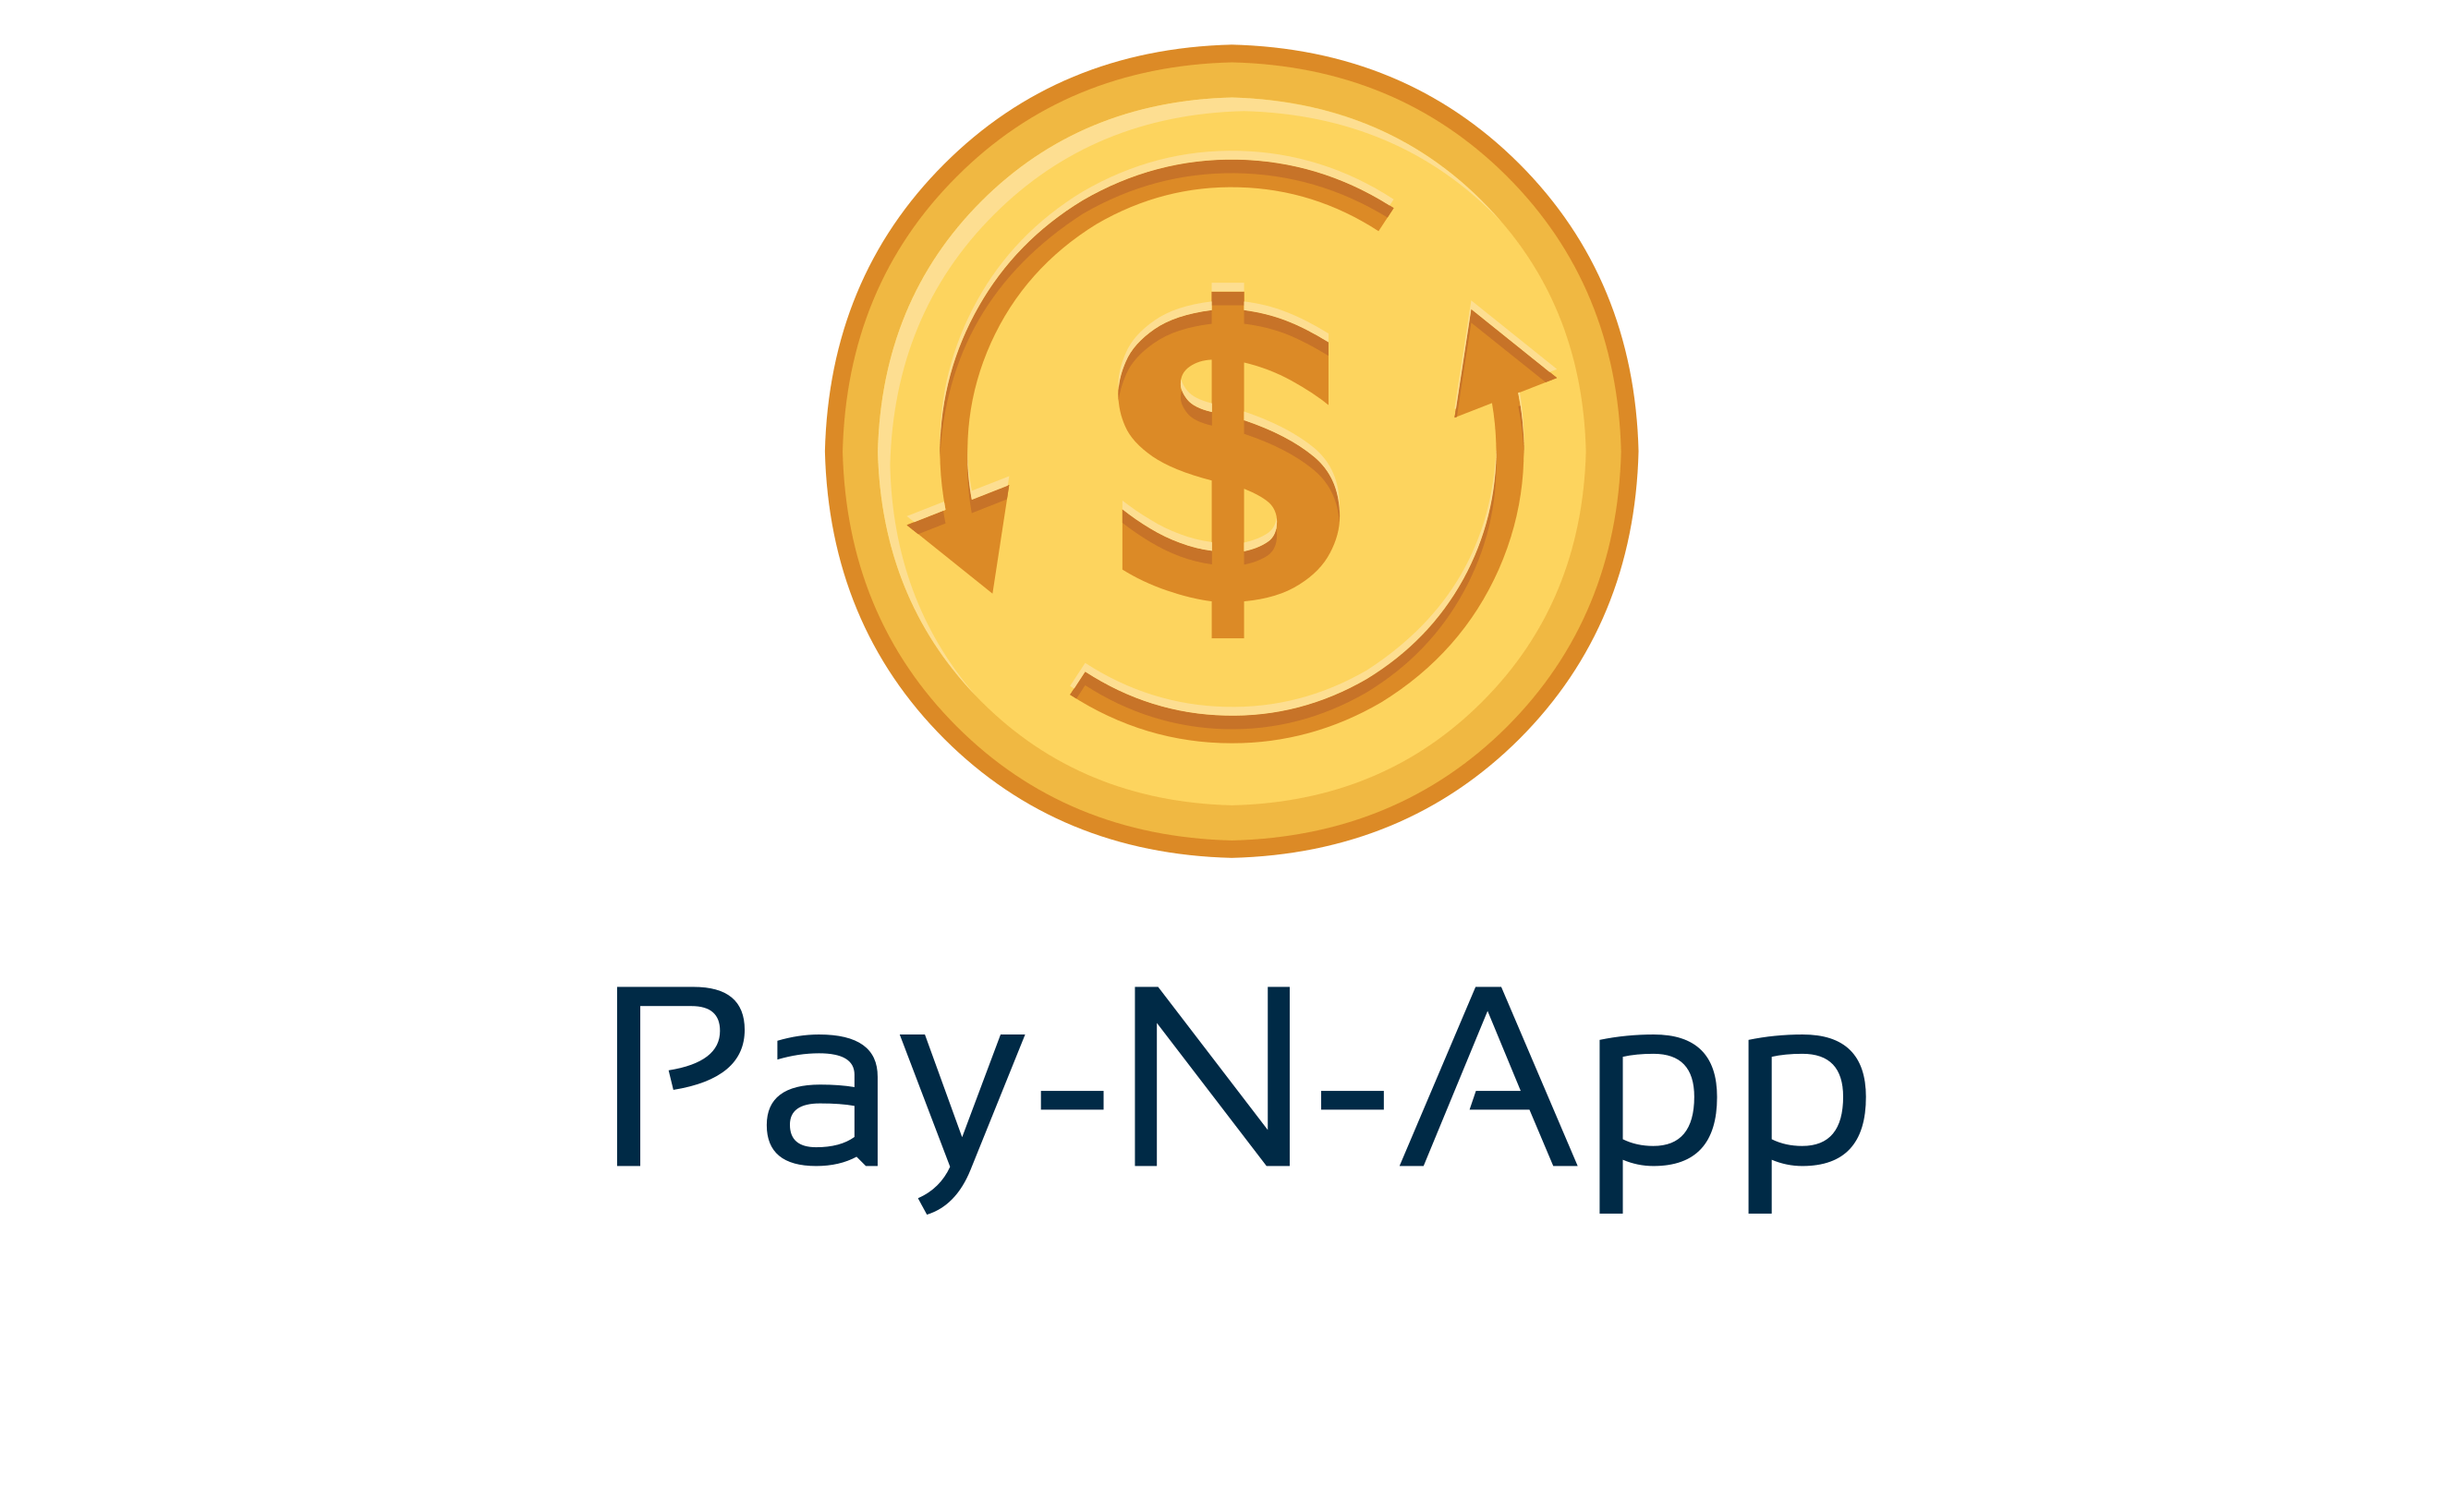 Pay-N-App